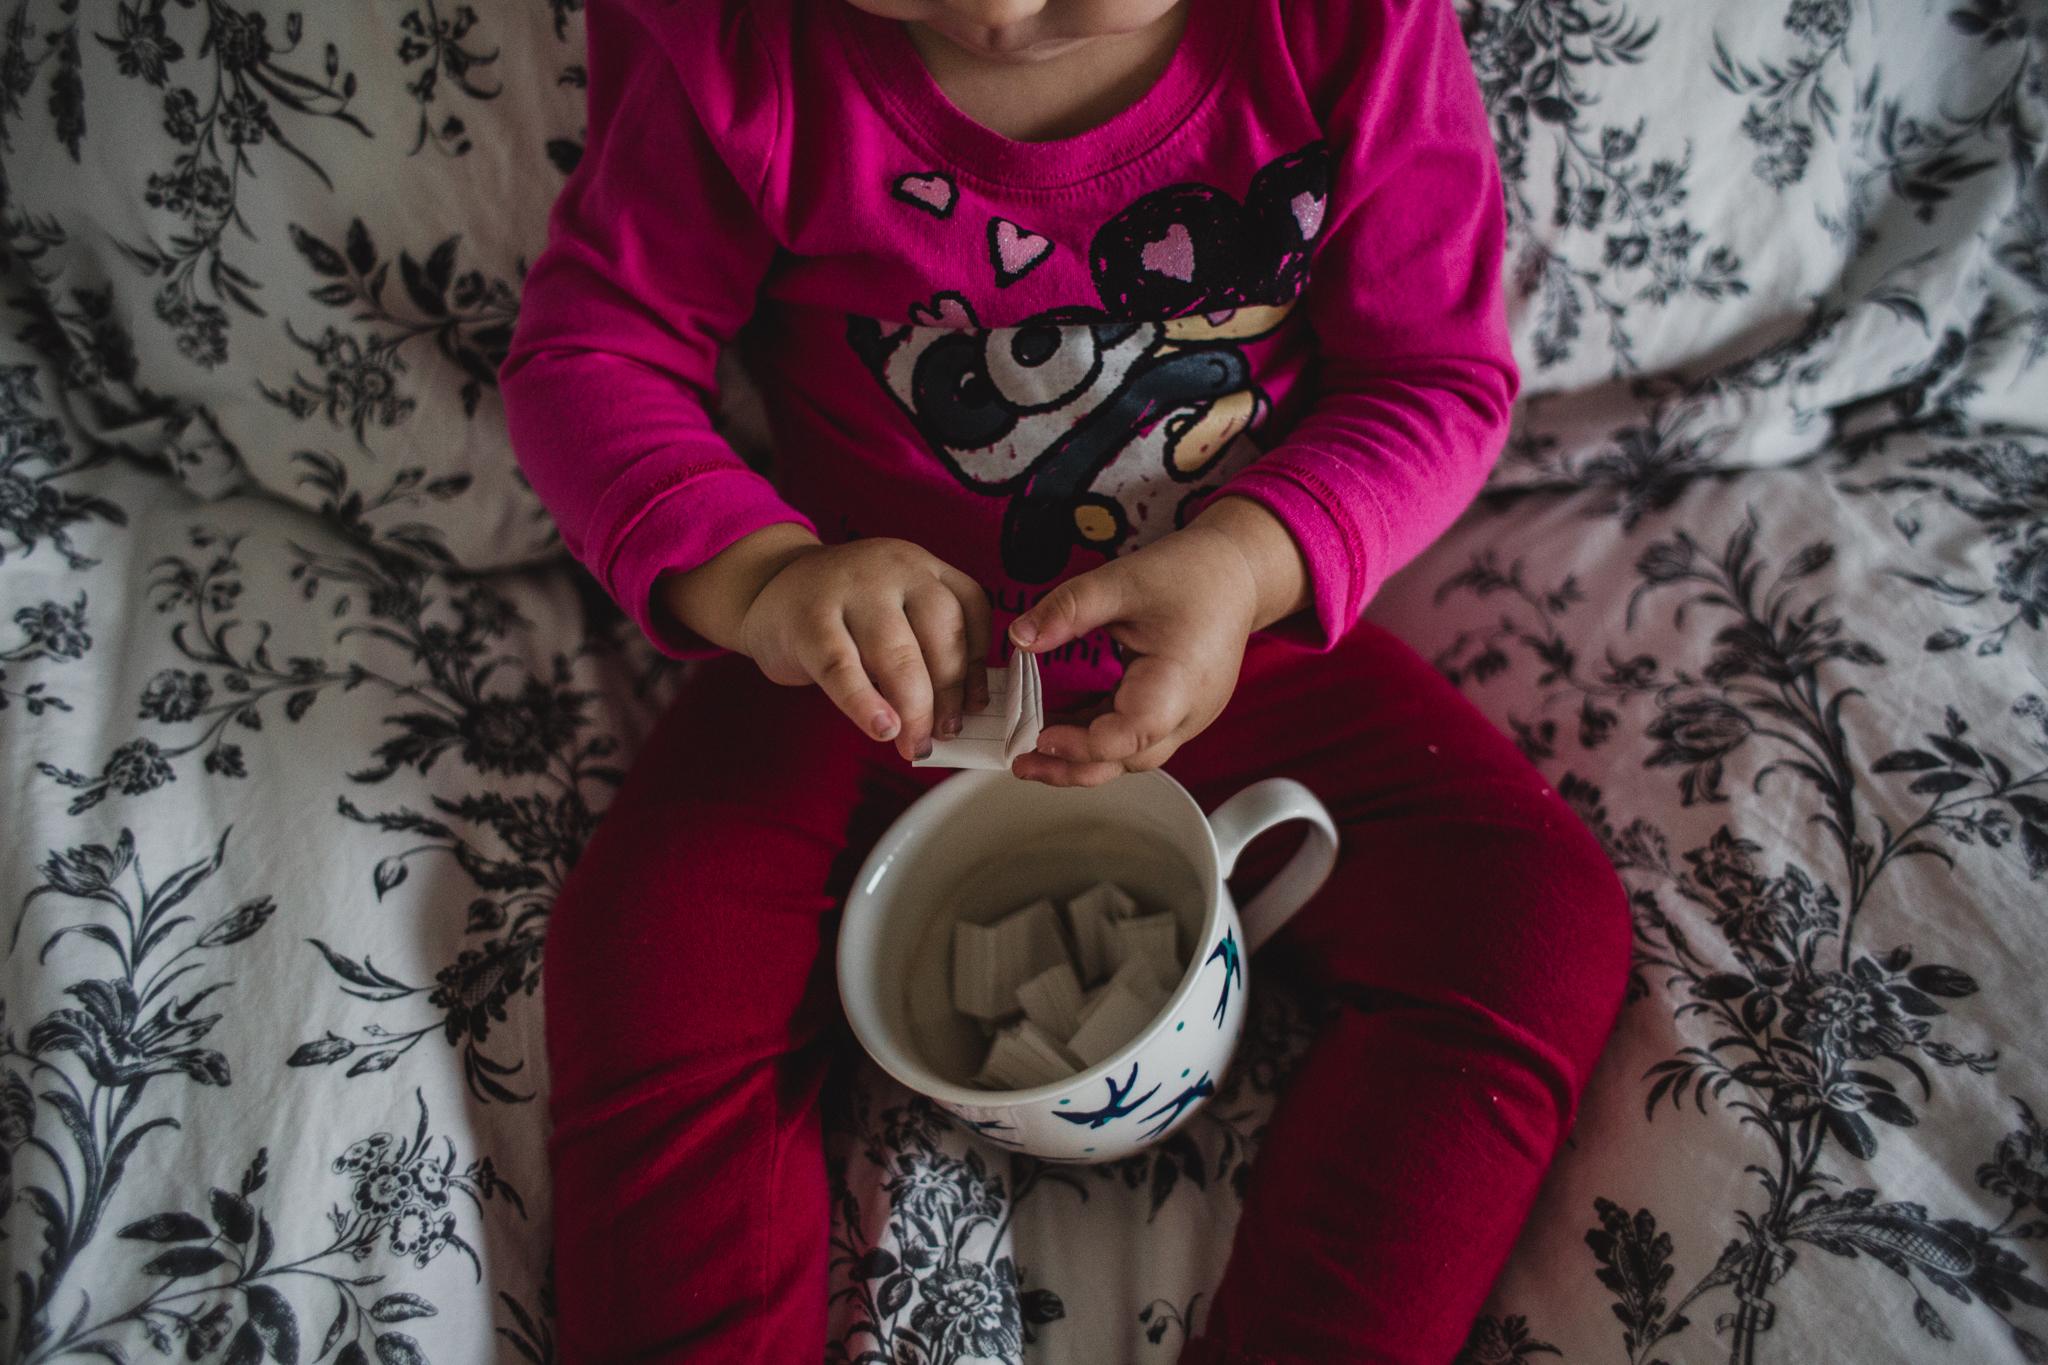 amazon gift card belly spa love paulina splechta photography birth maternity-5.jpg